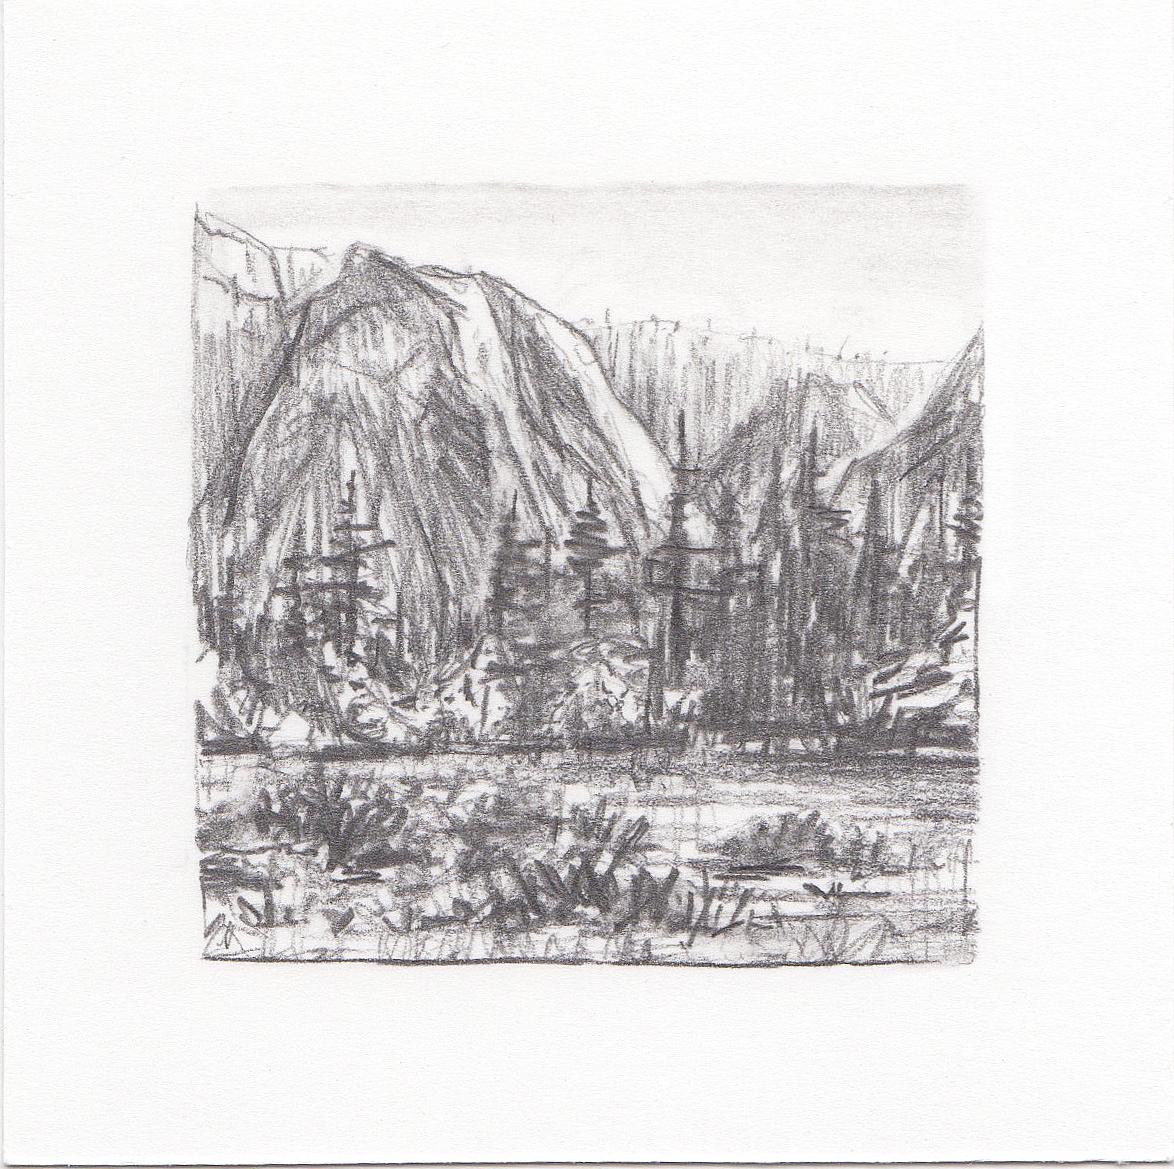 #24 Yosemite National Park, California | 3x3 | graphite